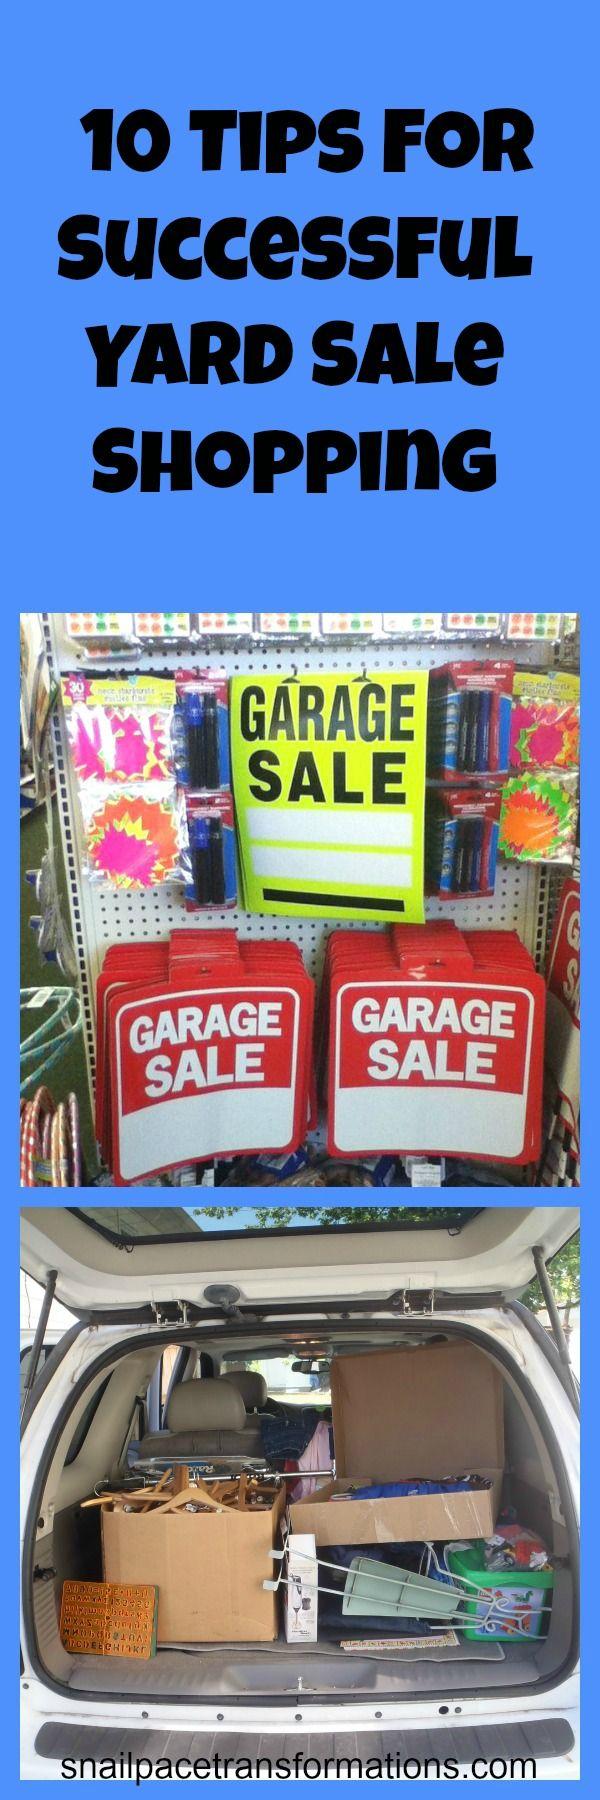 91 best yard sales images on pinterest yard sales garage sale